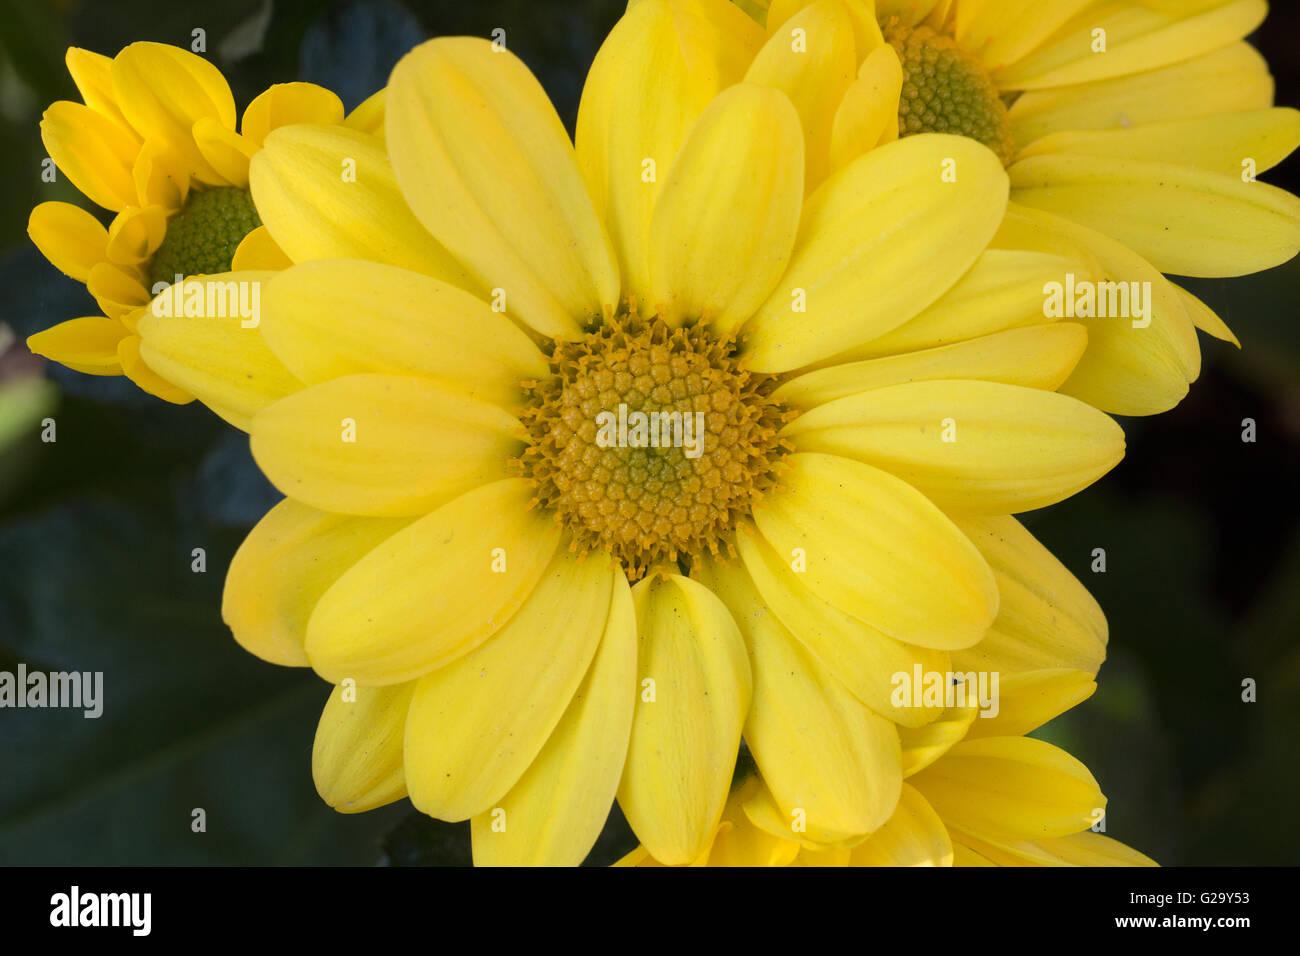 Gelbe Chrysanthemen Blüten, Makro  Yellow chrysanthemum flowers, macro - Stock Image